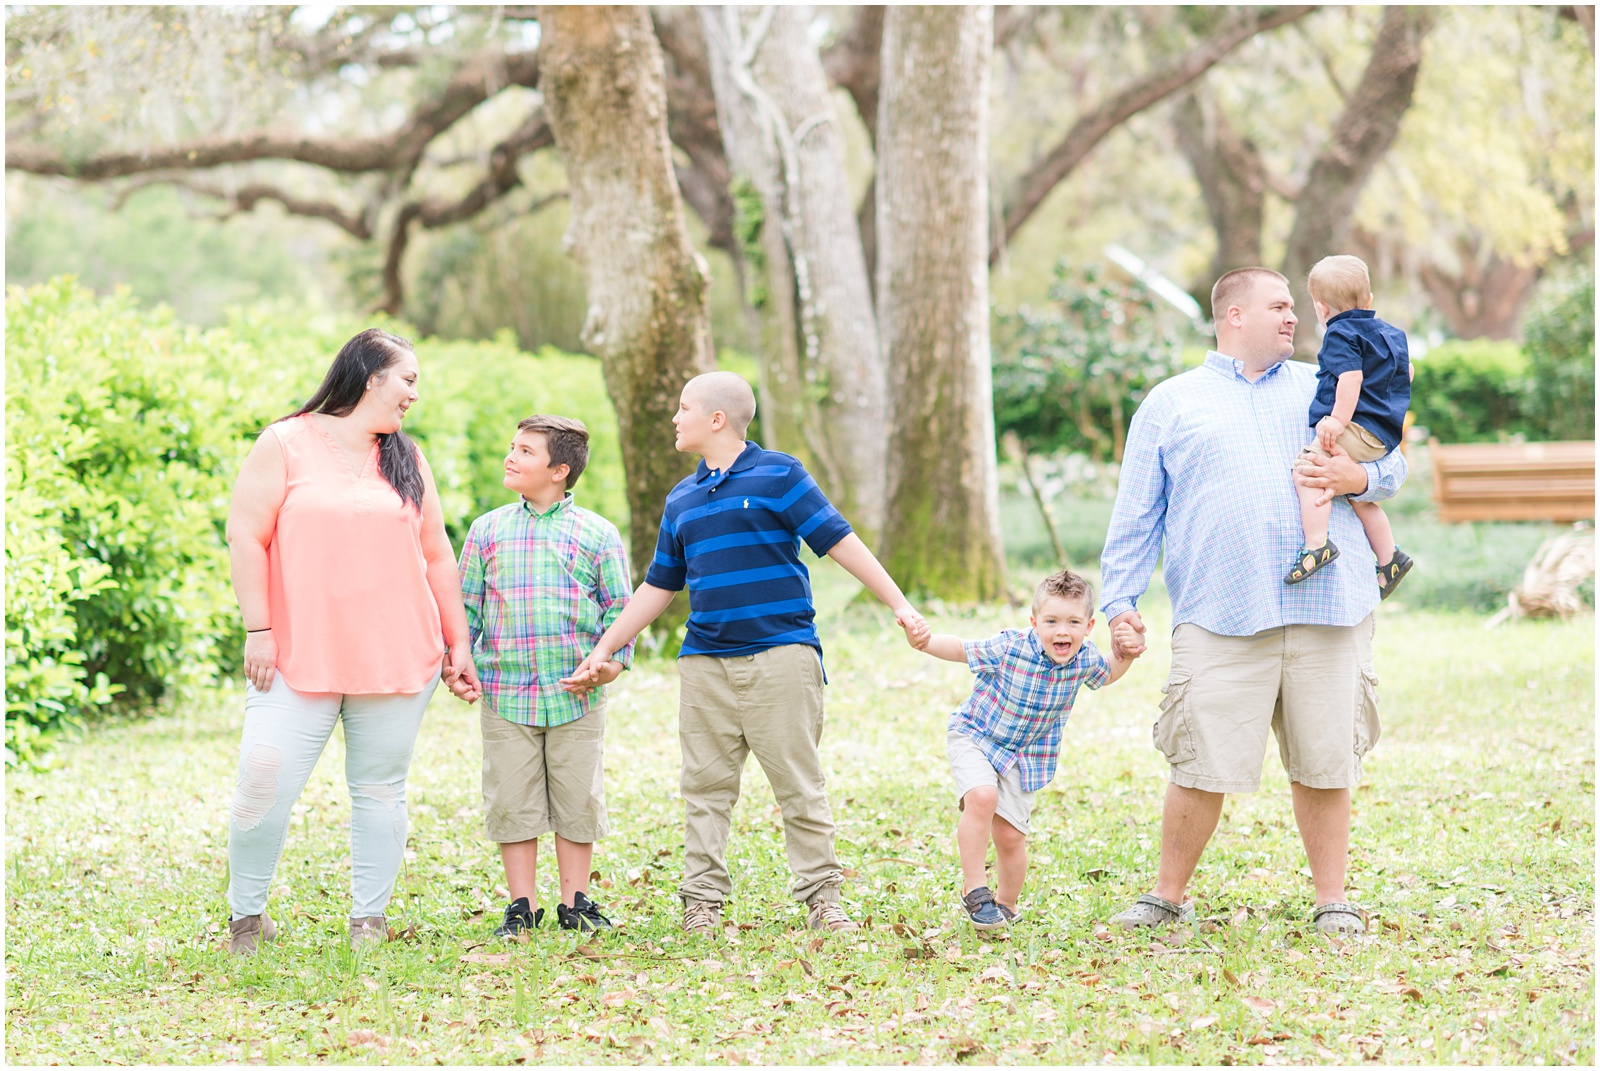 Washington Oaks_Garden_State Park_Family_Portraits_7.jpg